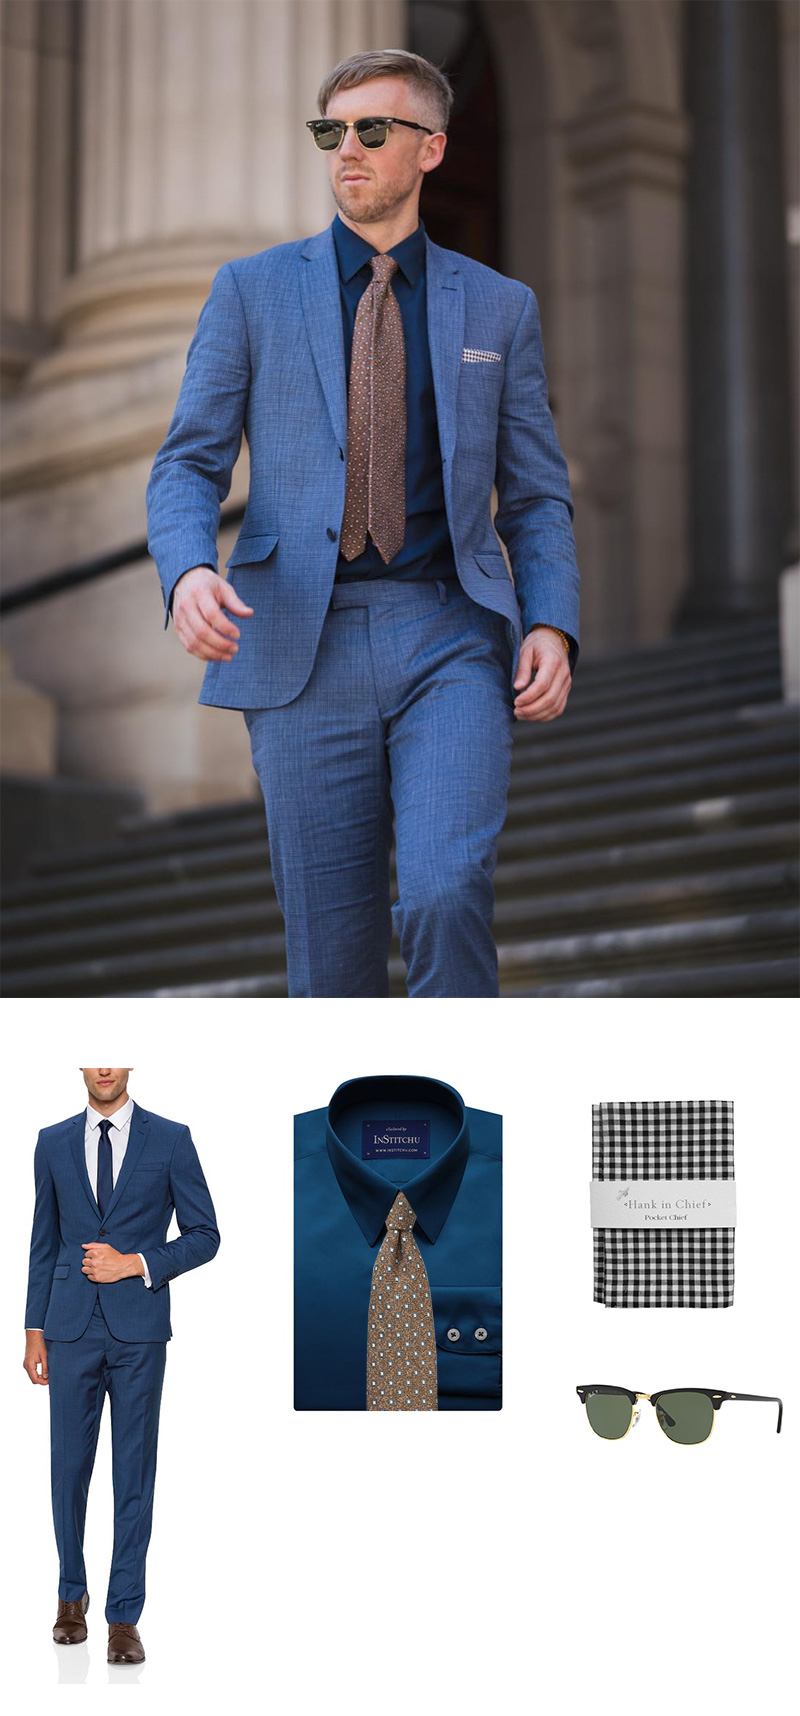 How To Accessorize A Dark Blue Dress Shirt